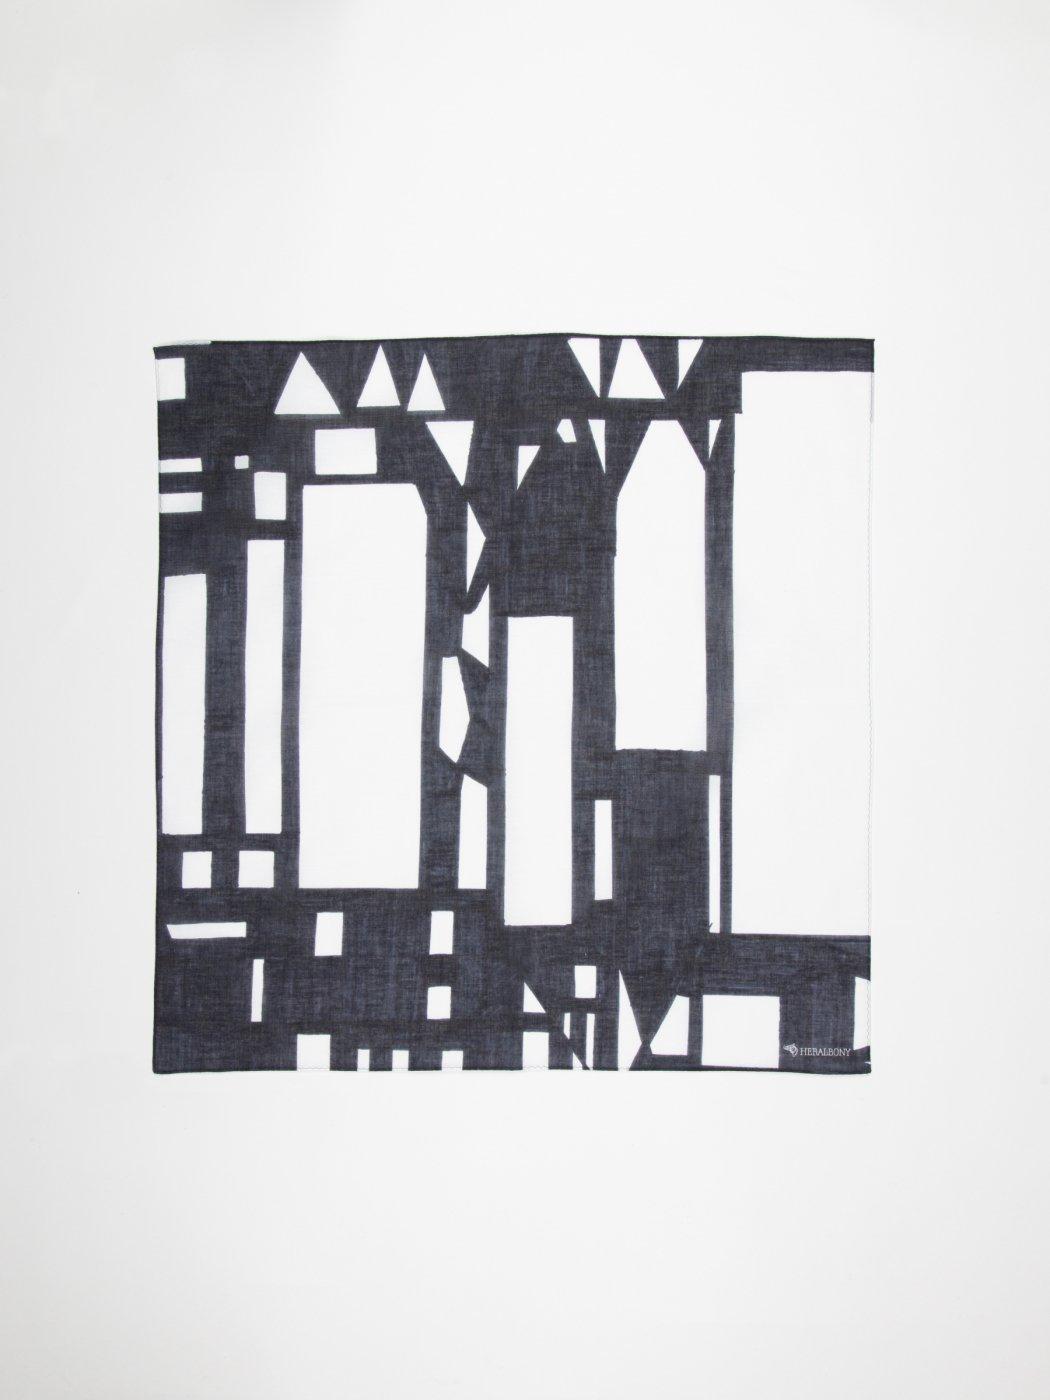 HERALBONY -ART HANDKERCHIEF-Kiyoshi Yaegashi-NO TITLE(HOUSE)-BLACK-